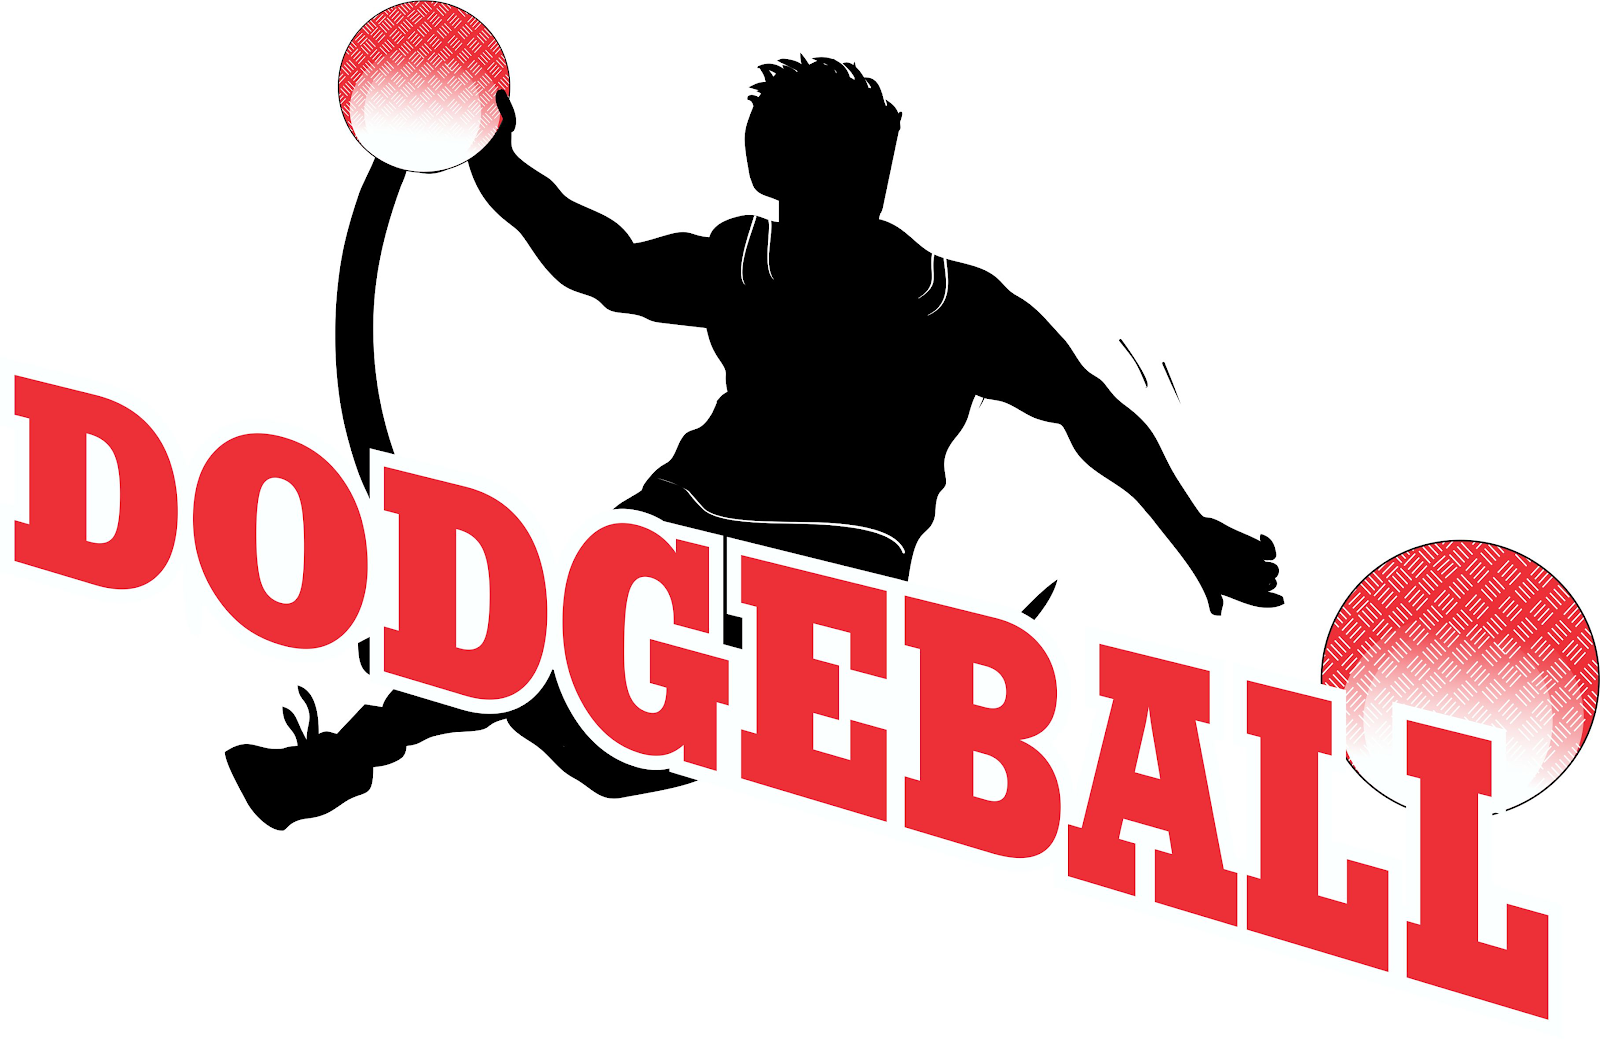 dodgeball clipart at getdrawings com free for personal use rh getdrawings com dodgeball pictures clip art